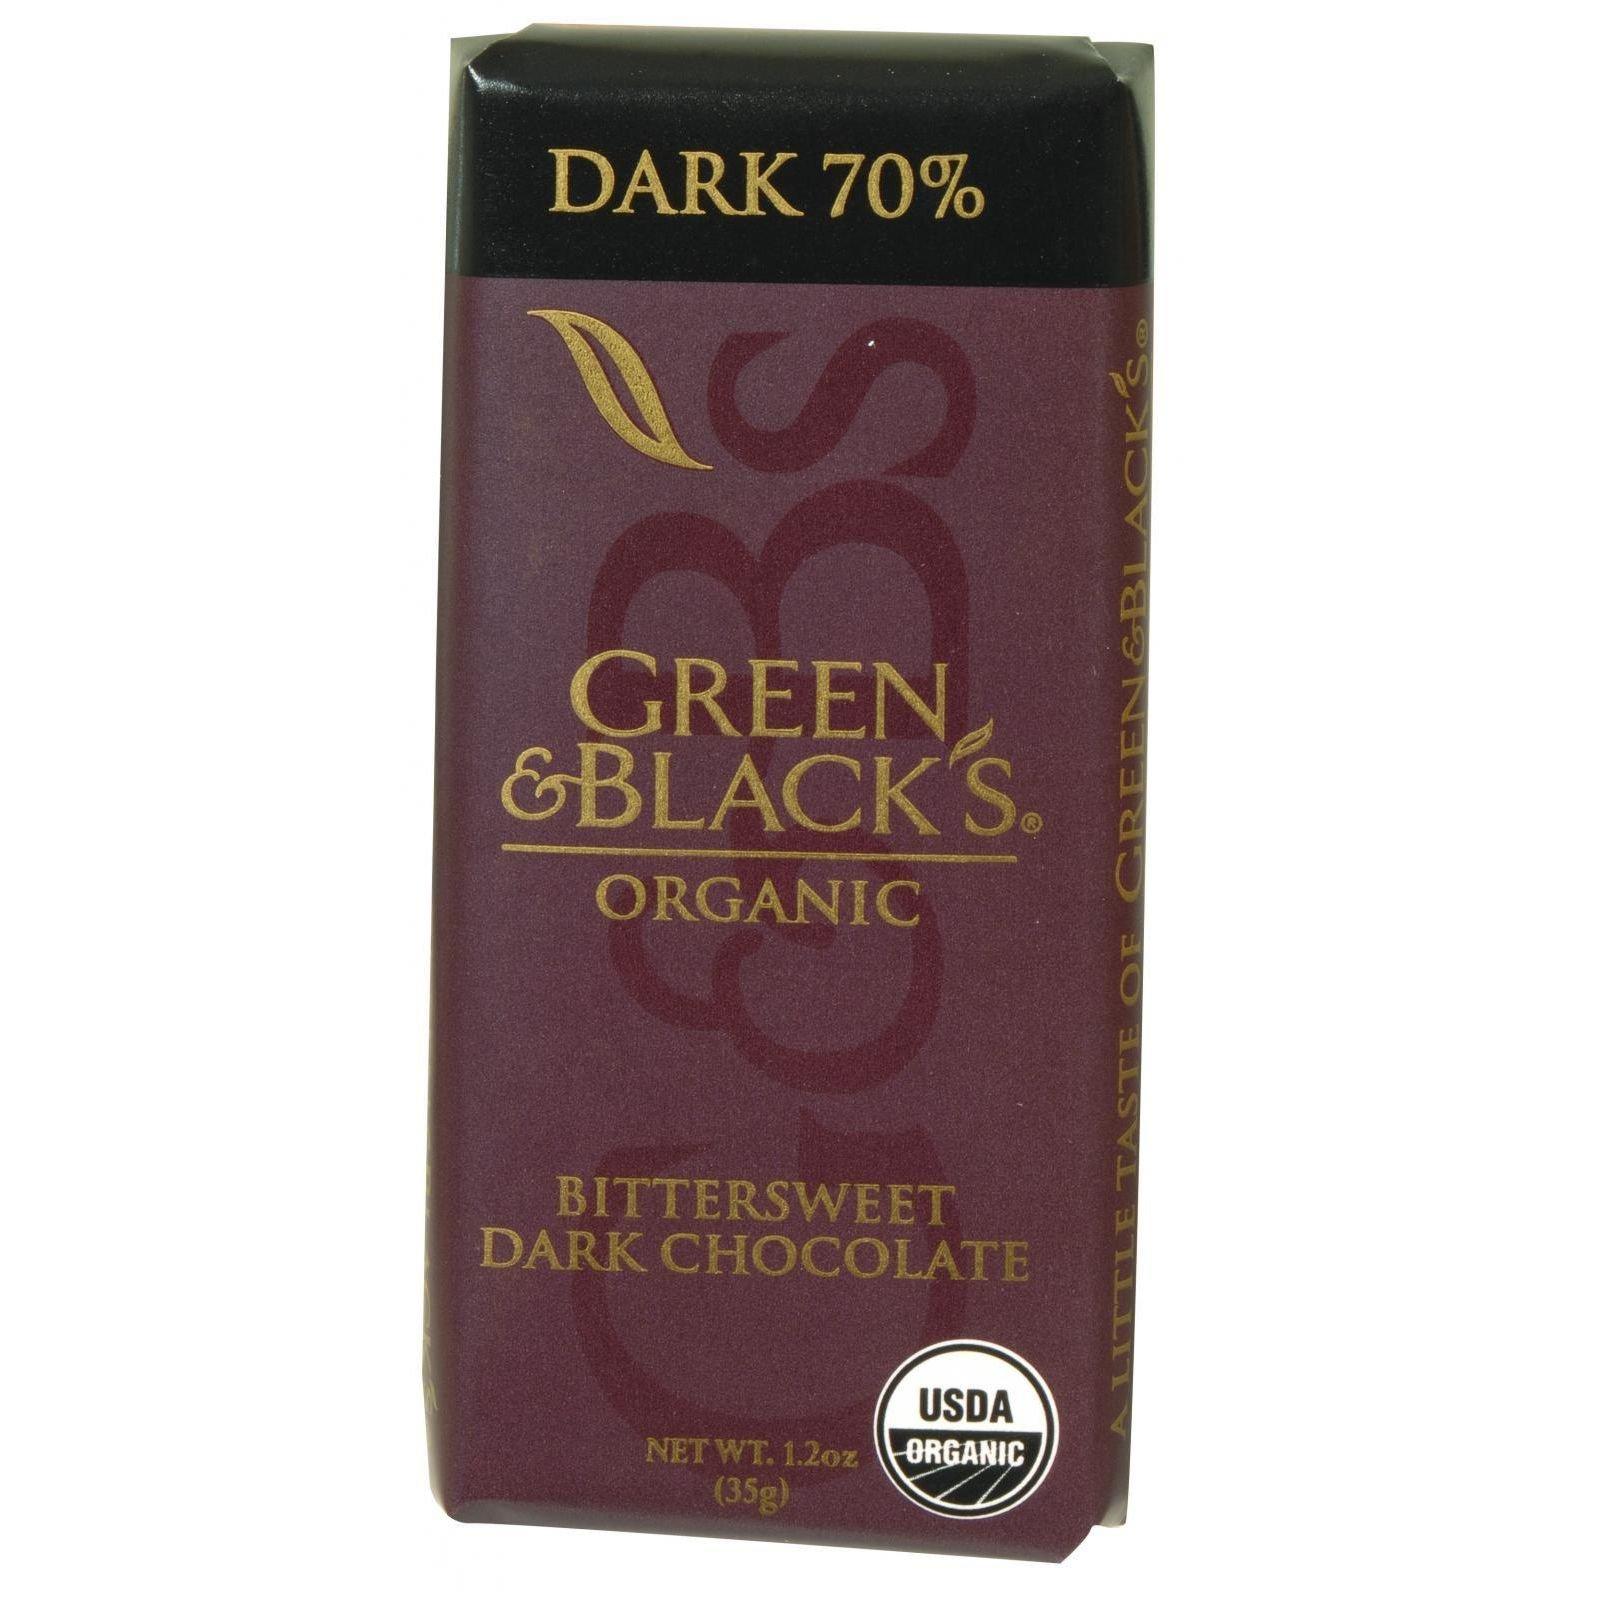 Green and Blacks Organic Chocolate Bars - Bittersweet Dark Chocolate - 70 Percent Cacao - Impulse Bars - 1.2 oz - Case of 20-95%+ Organic - by Green & Black's